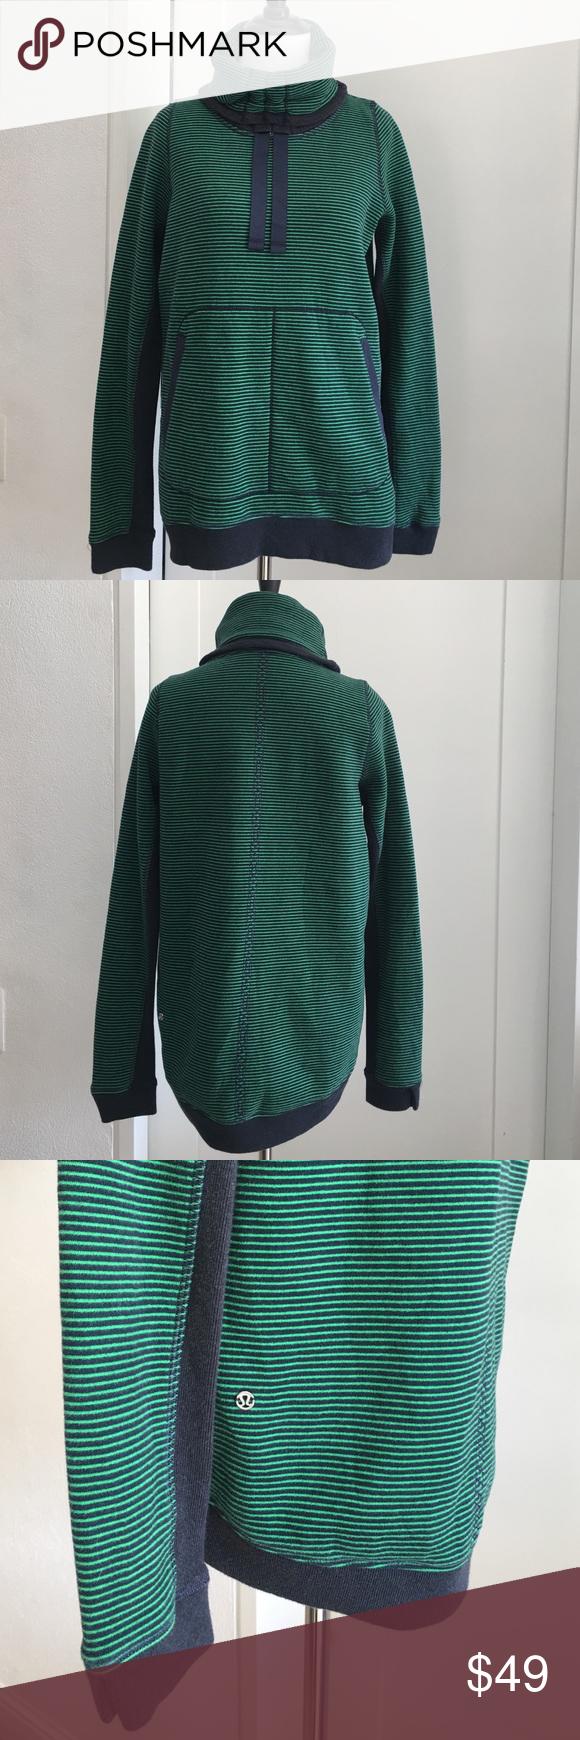 Lululemon Green Blue Striped Turtleneck Sweater 4 | Lululemon and ...